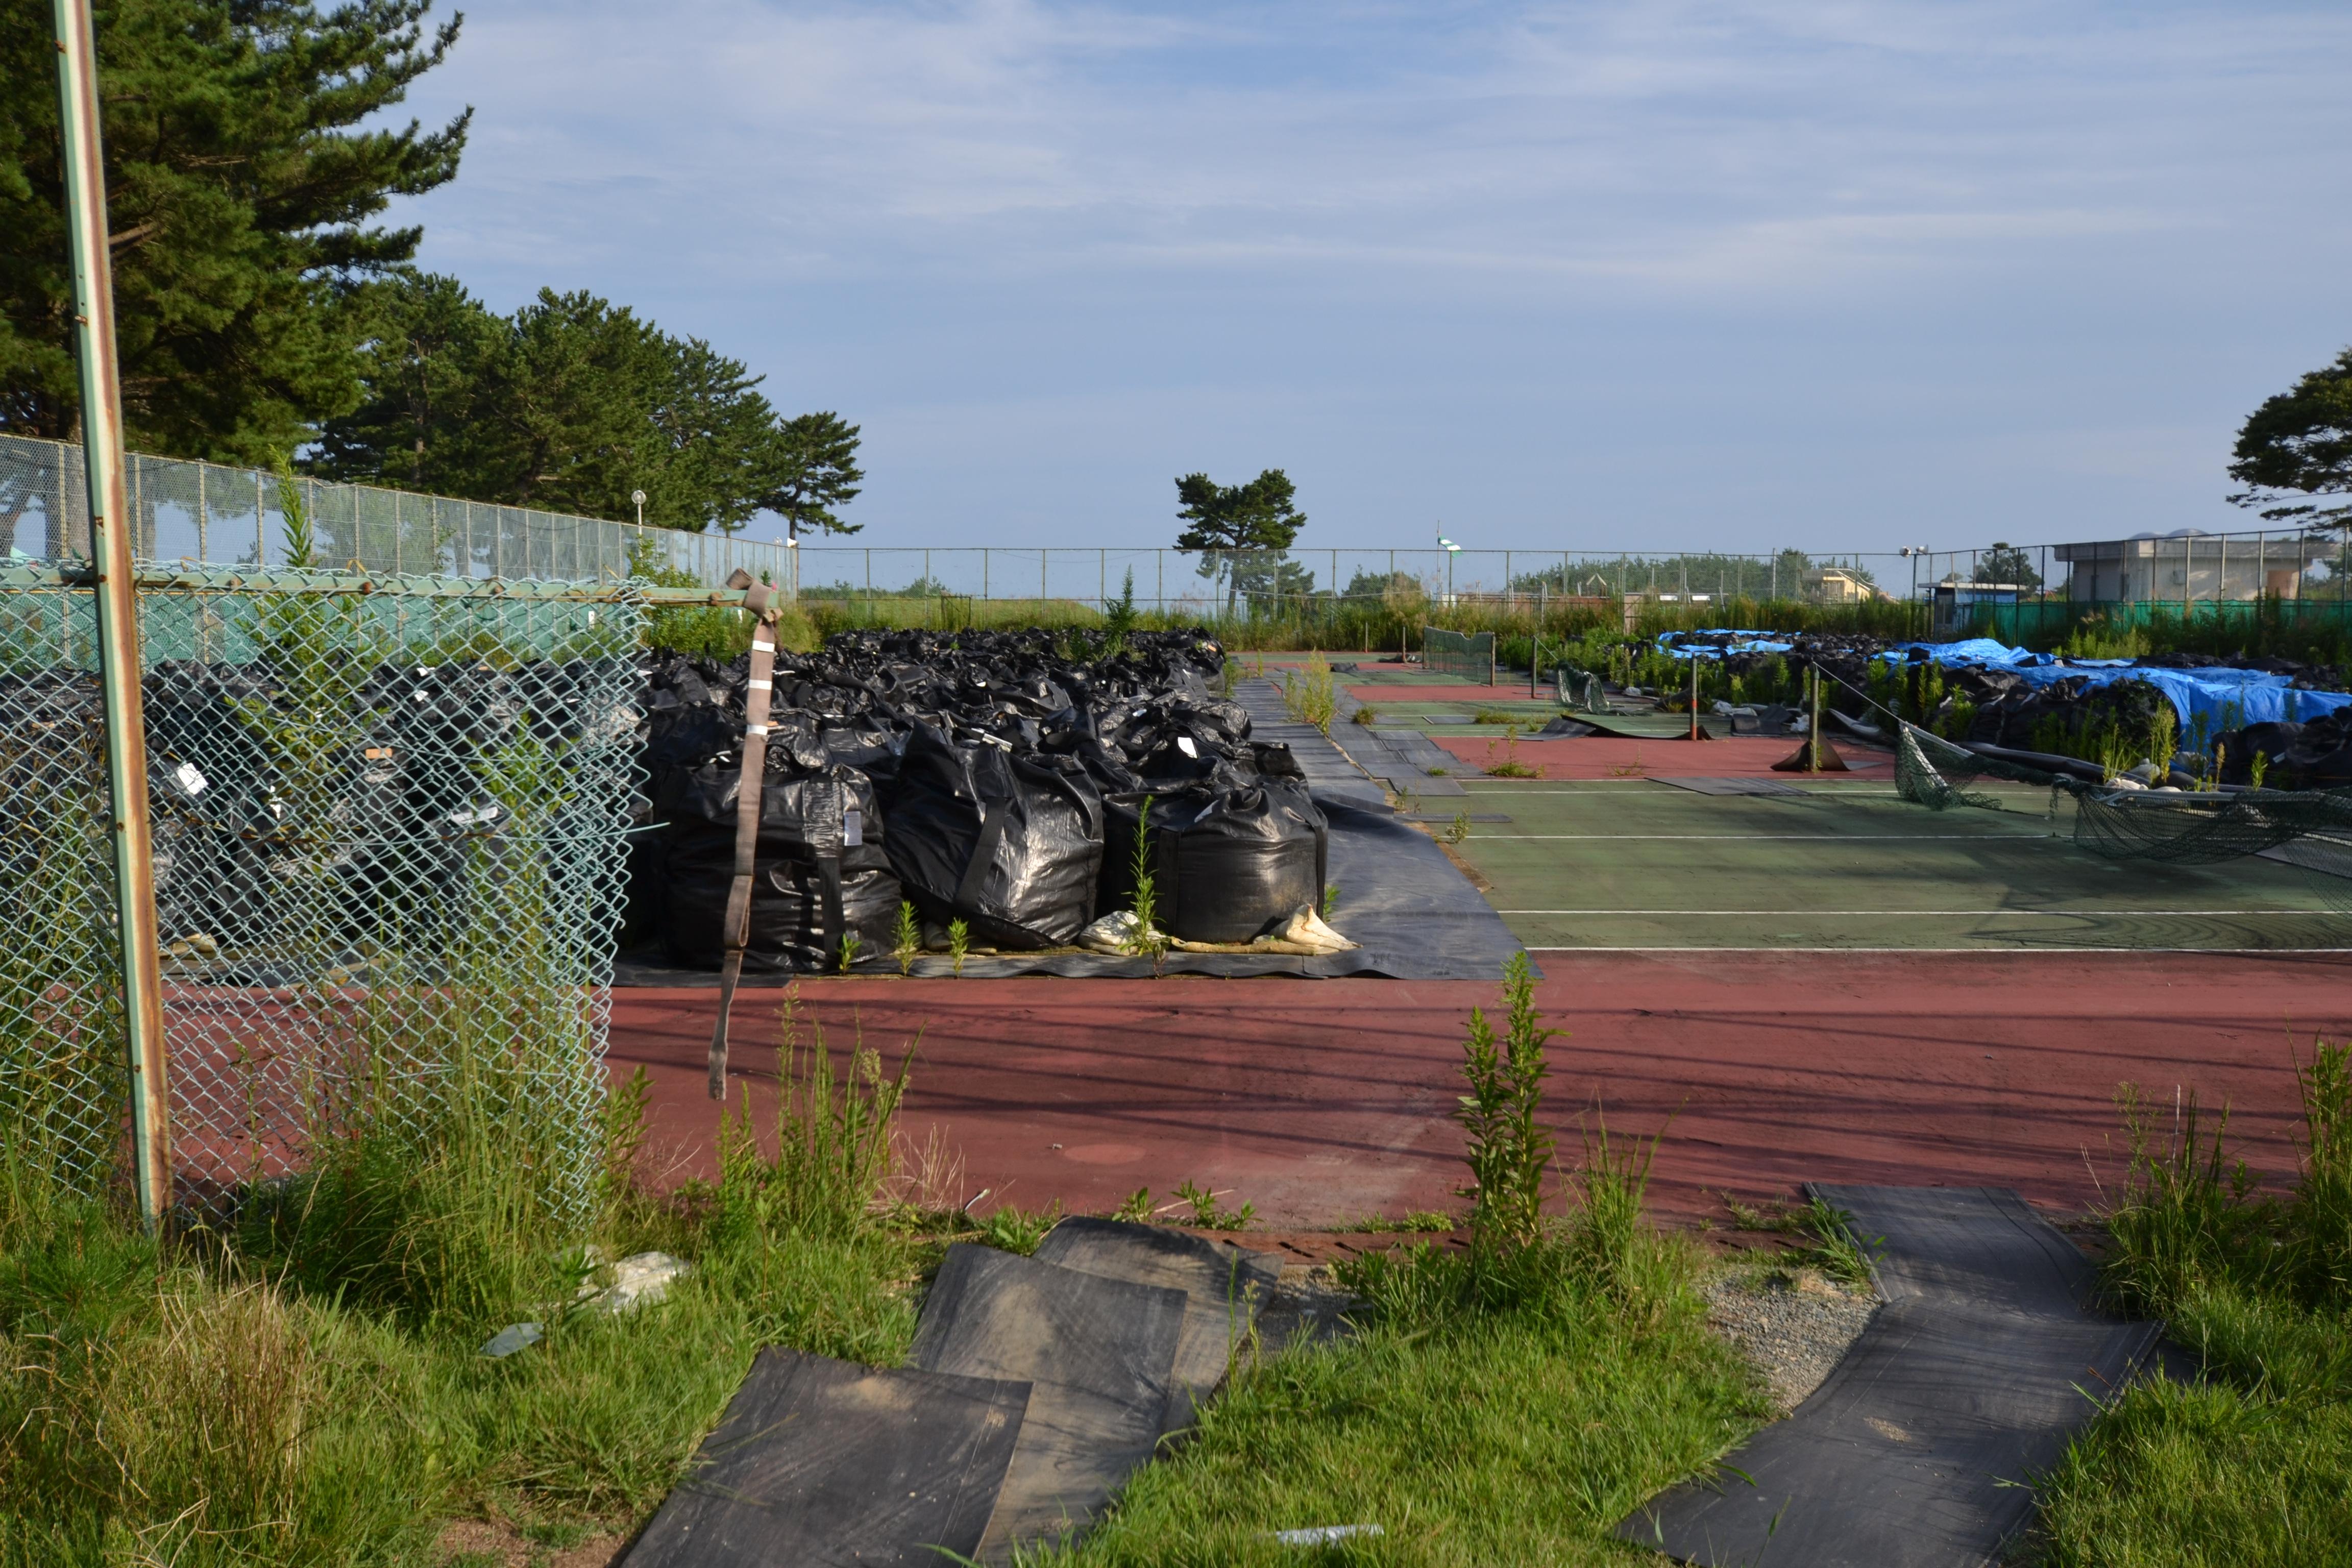 fukushima J-village soccer training center tonne bags radiation.JPG